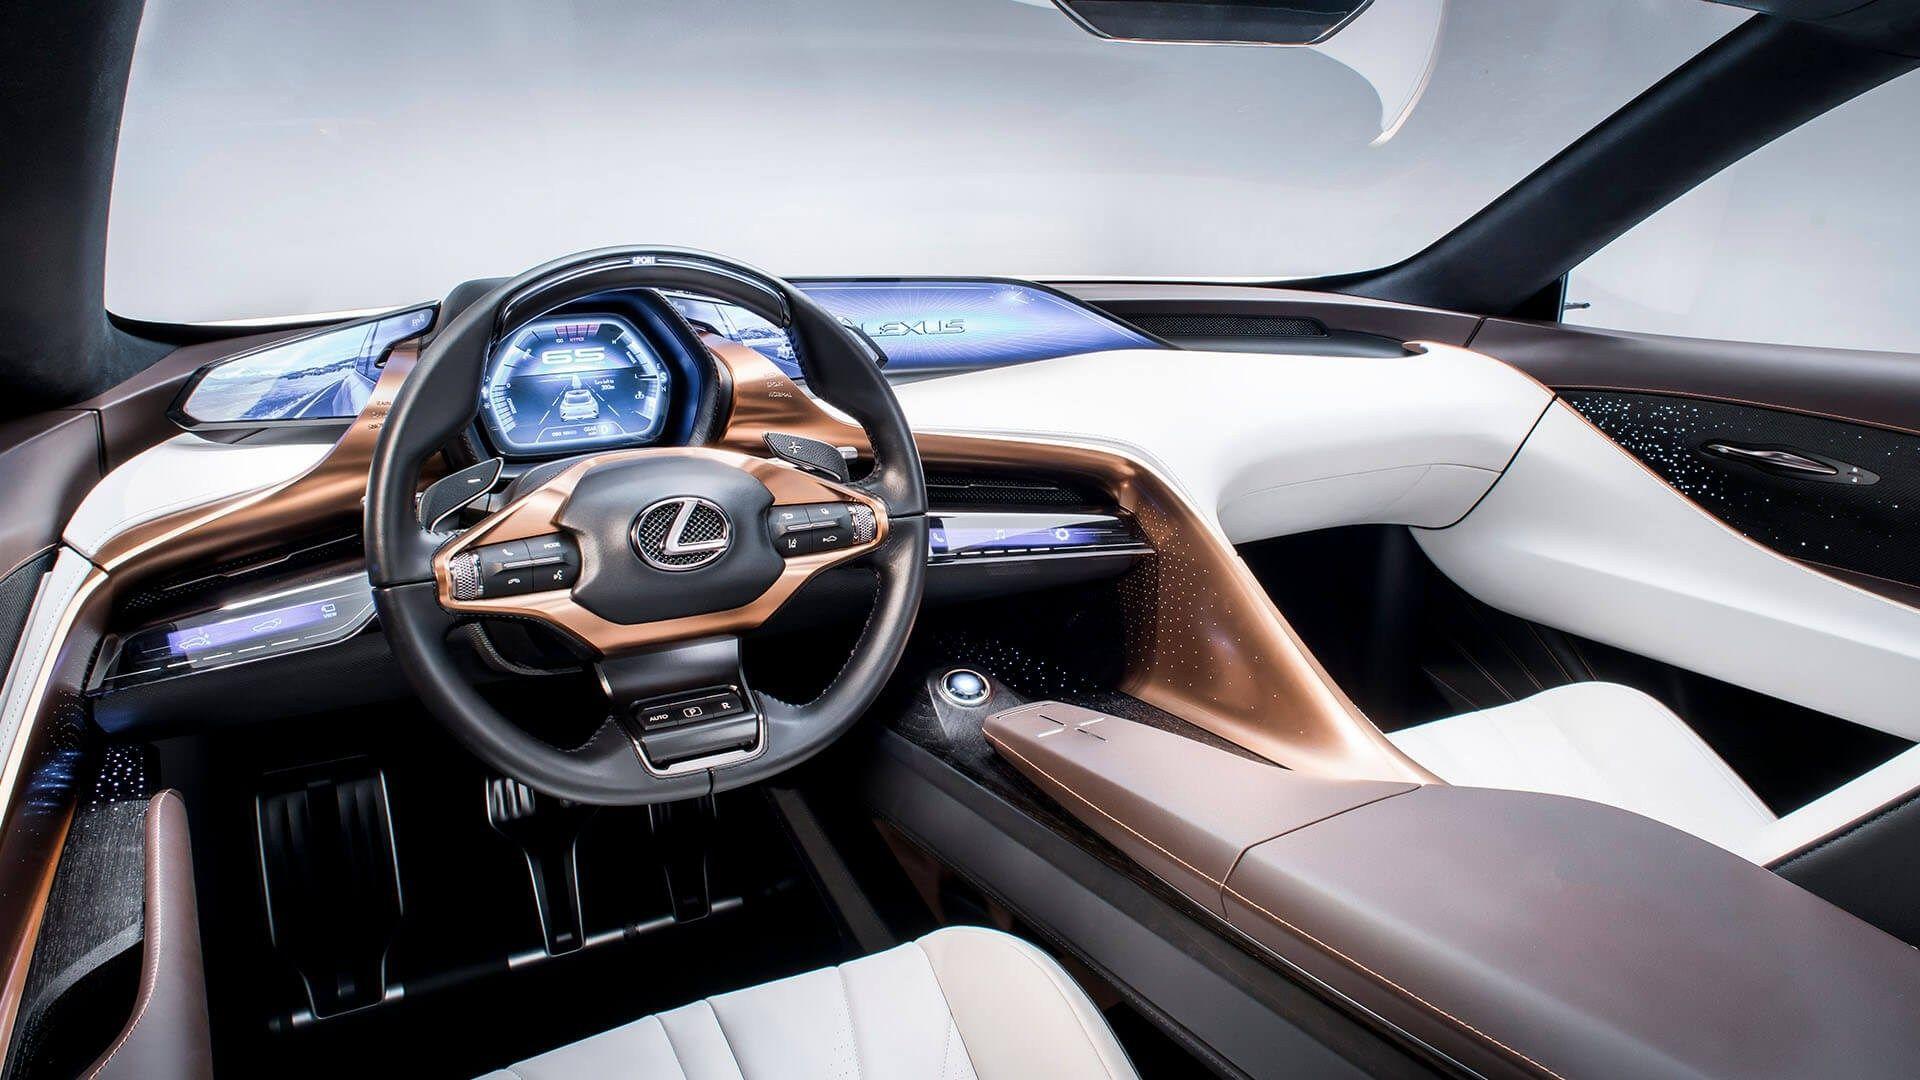 Lexus Lf 1 Limitless 2020 First Drive Price Performance And Review New Lexus Lexus Lexus Interior